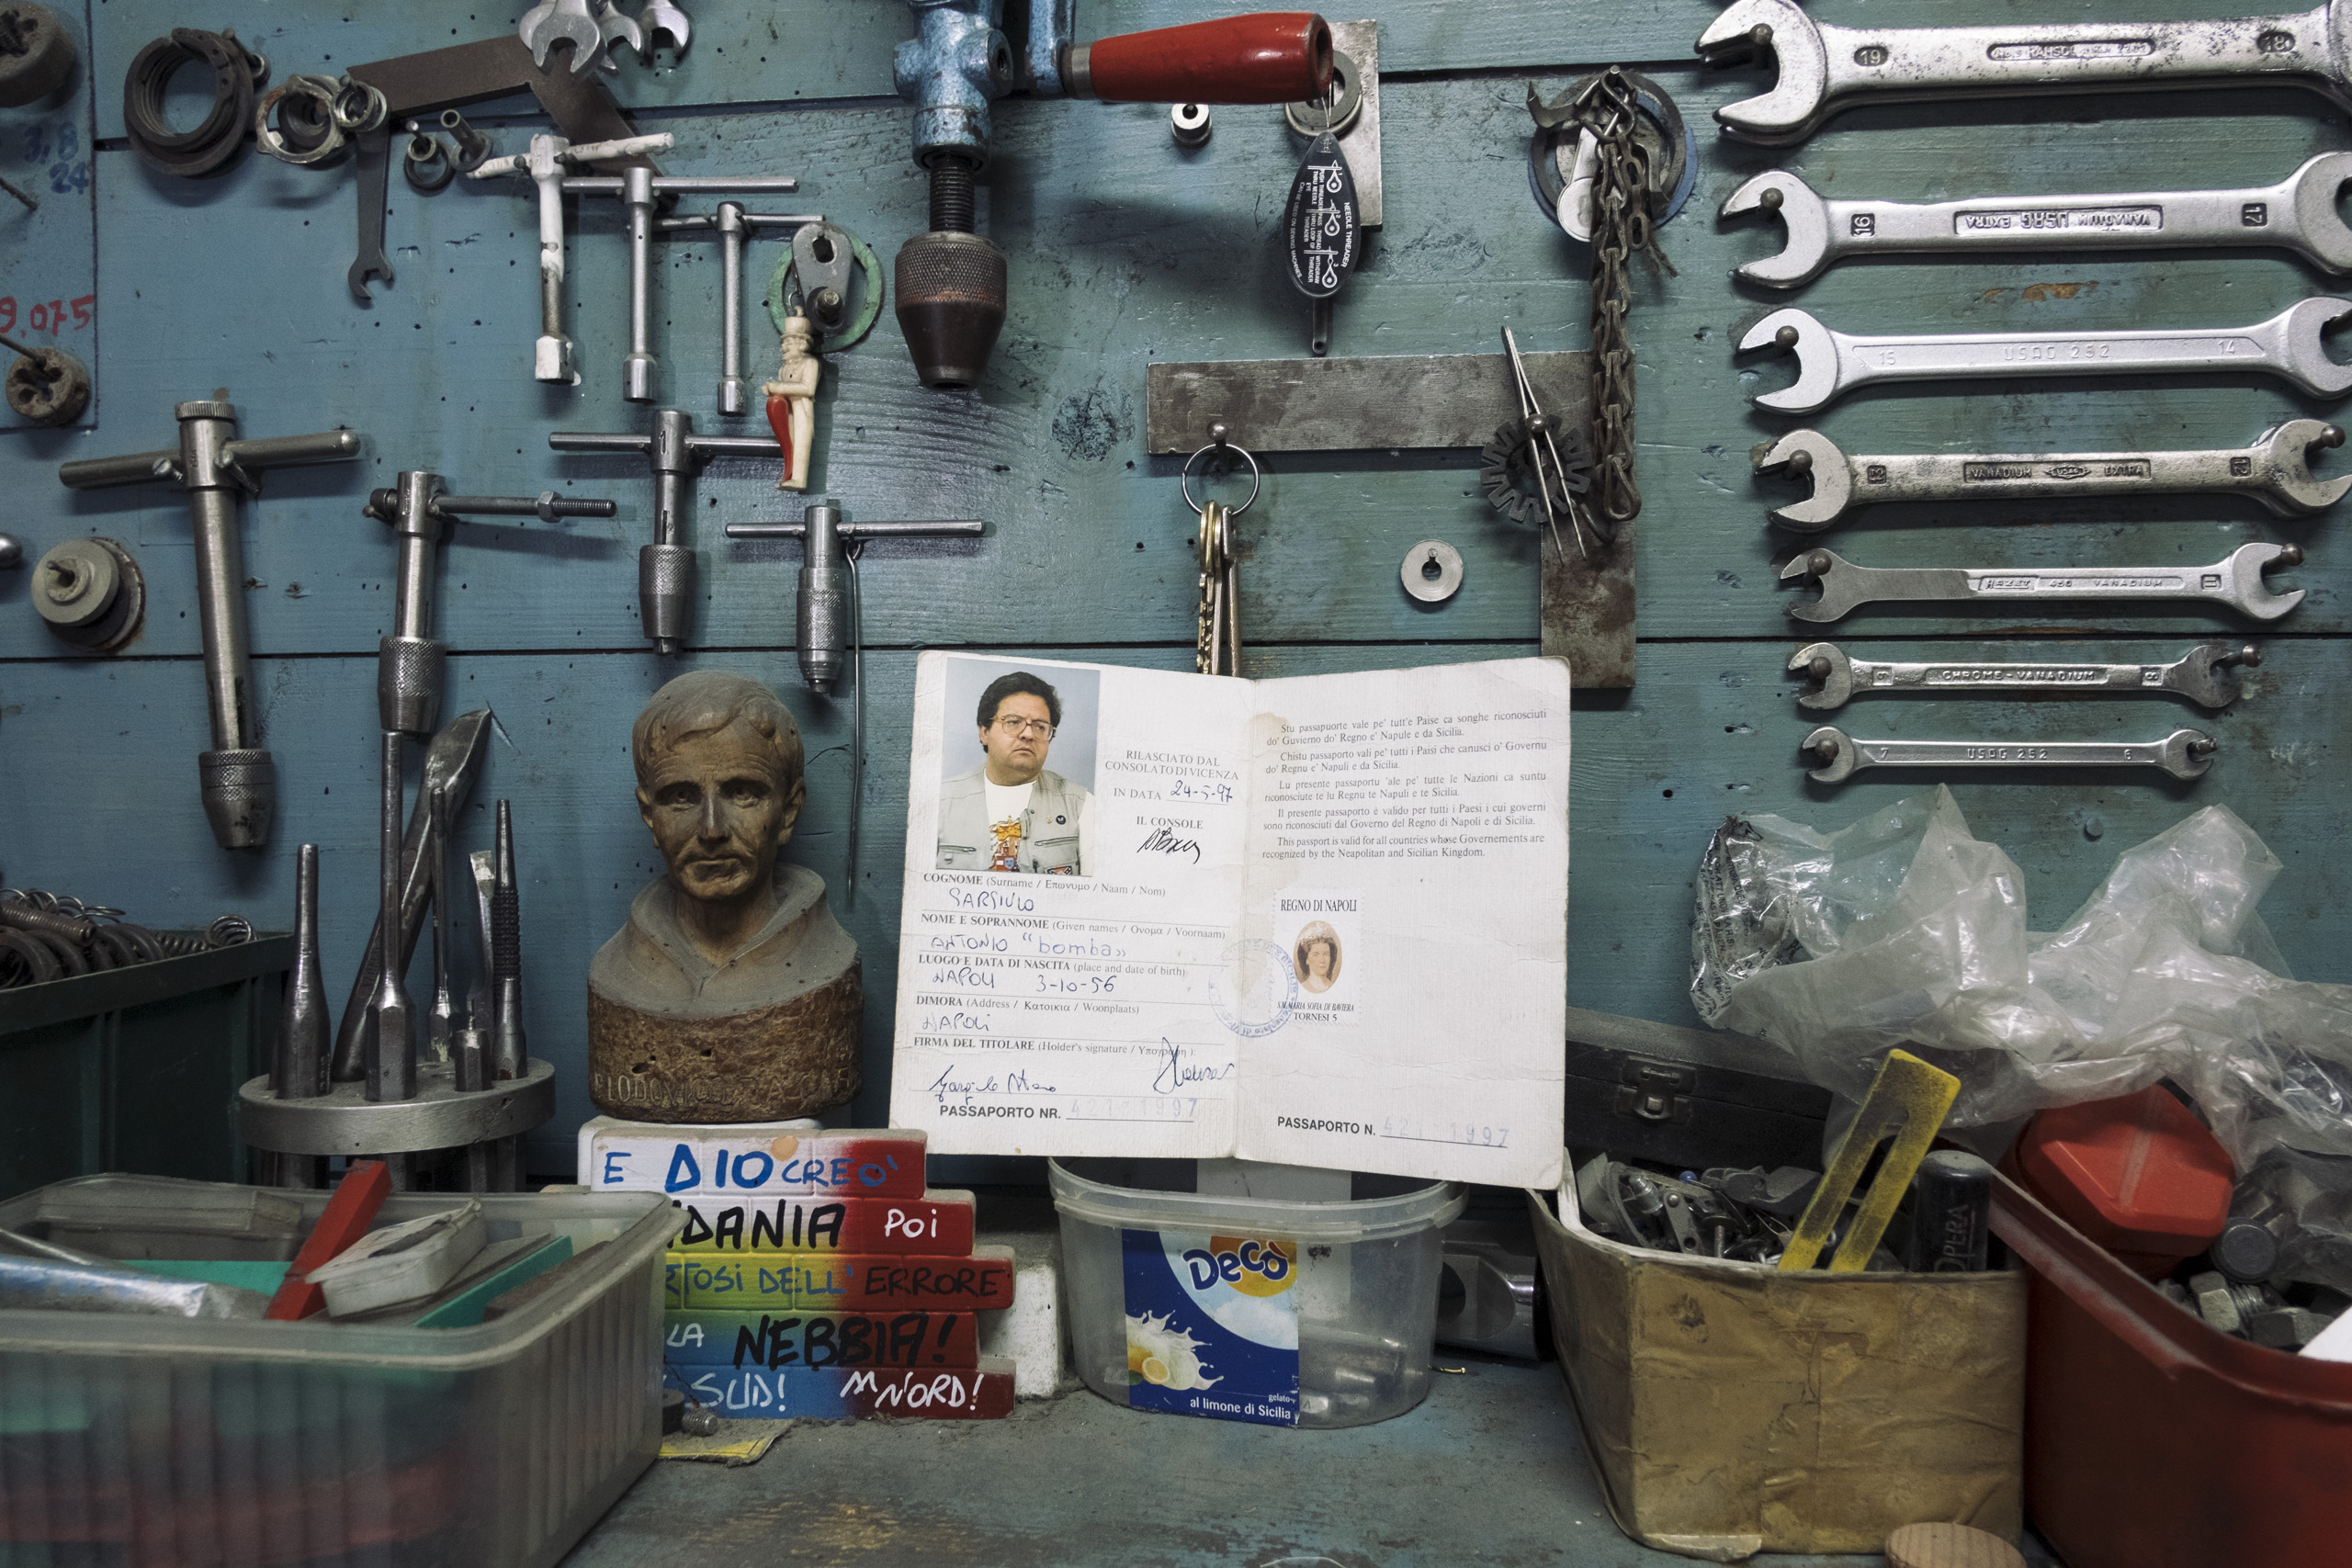 A Kingdom of Two Sicilies passport belonging to a Neapolitan artisan, April, 2016.